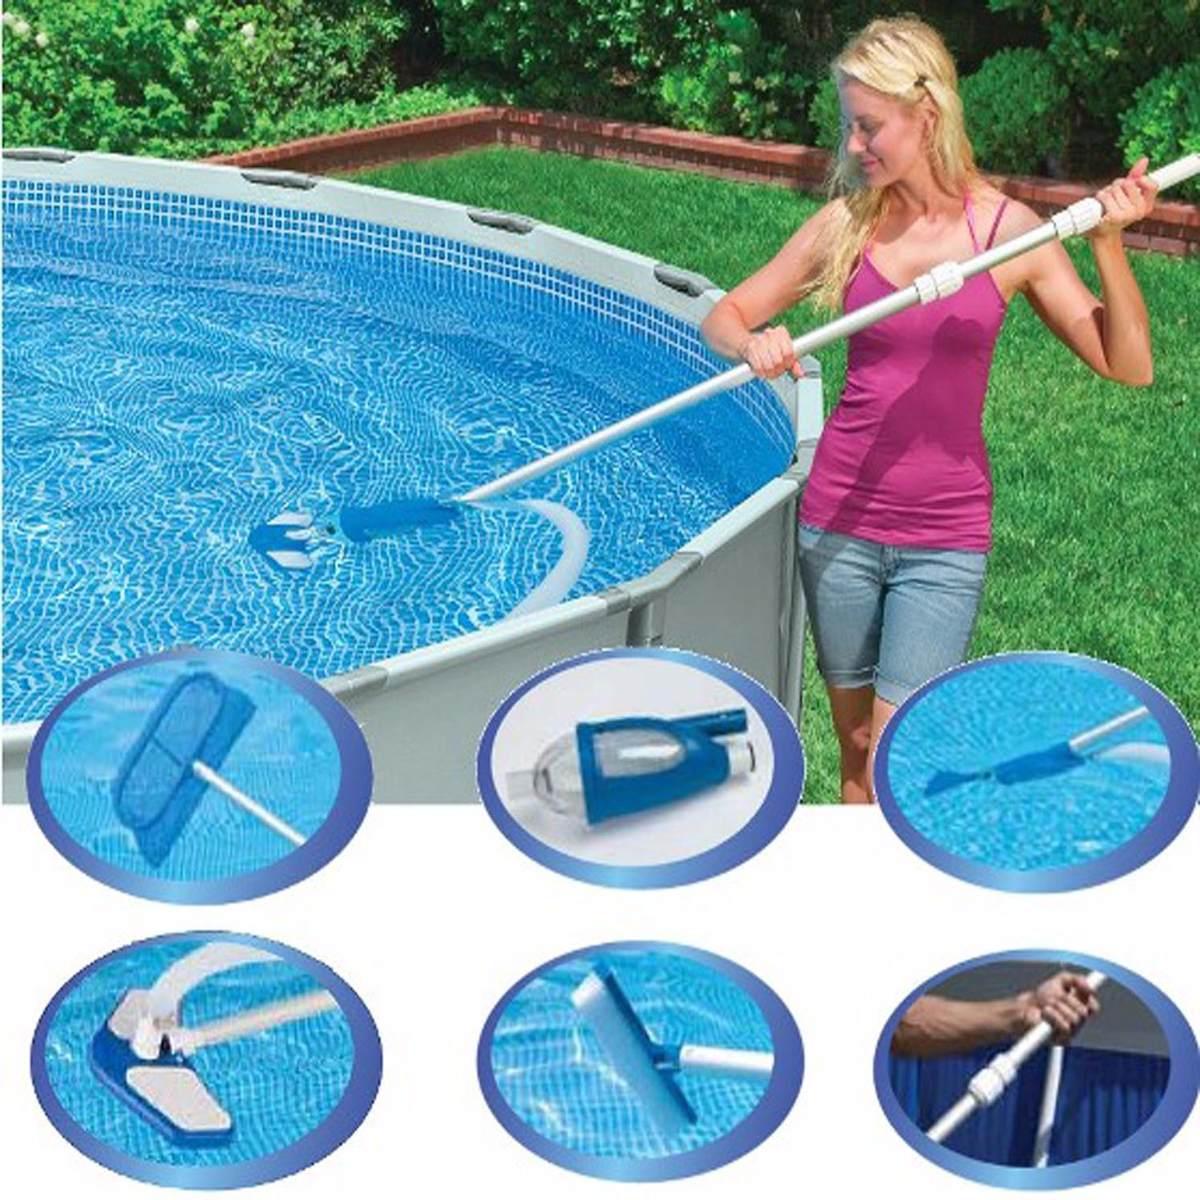 Kit aspiradora mantenimiento lujo intex 28003 env o - Salfuman para limpiar piscinas ...